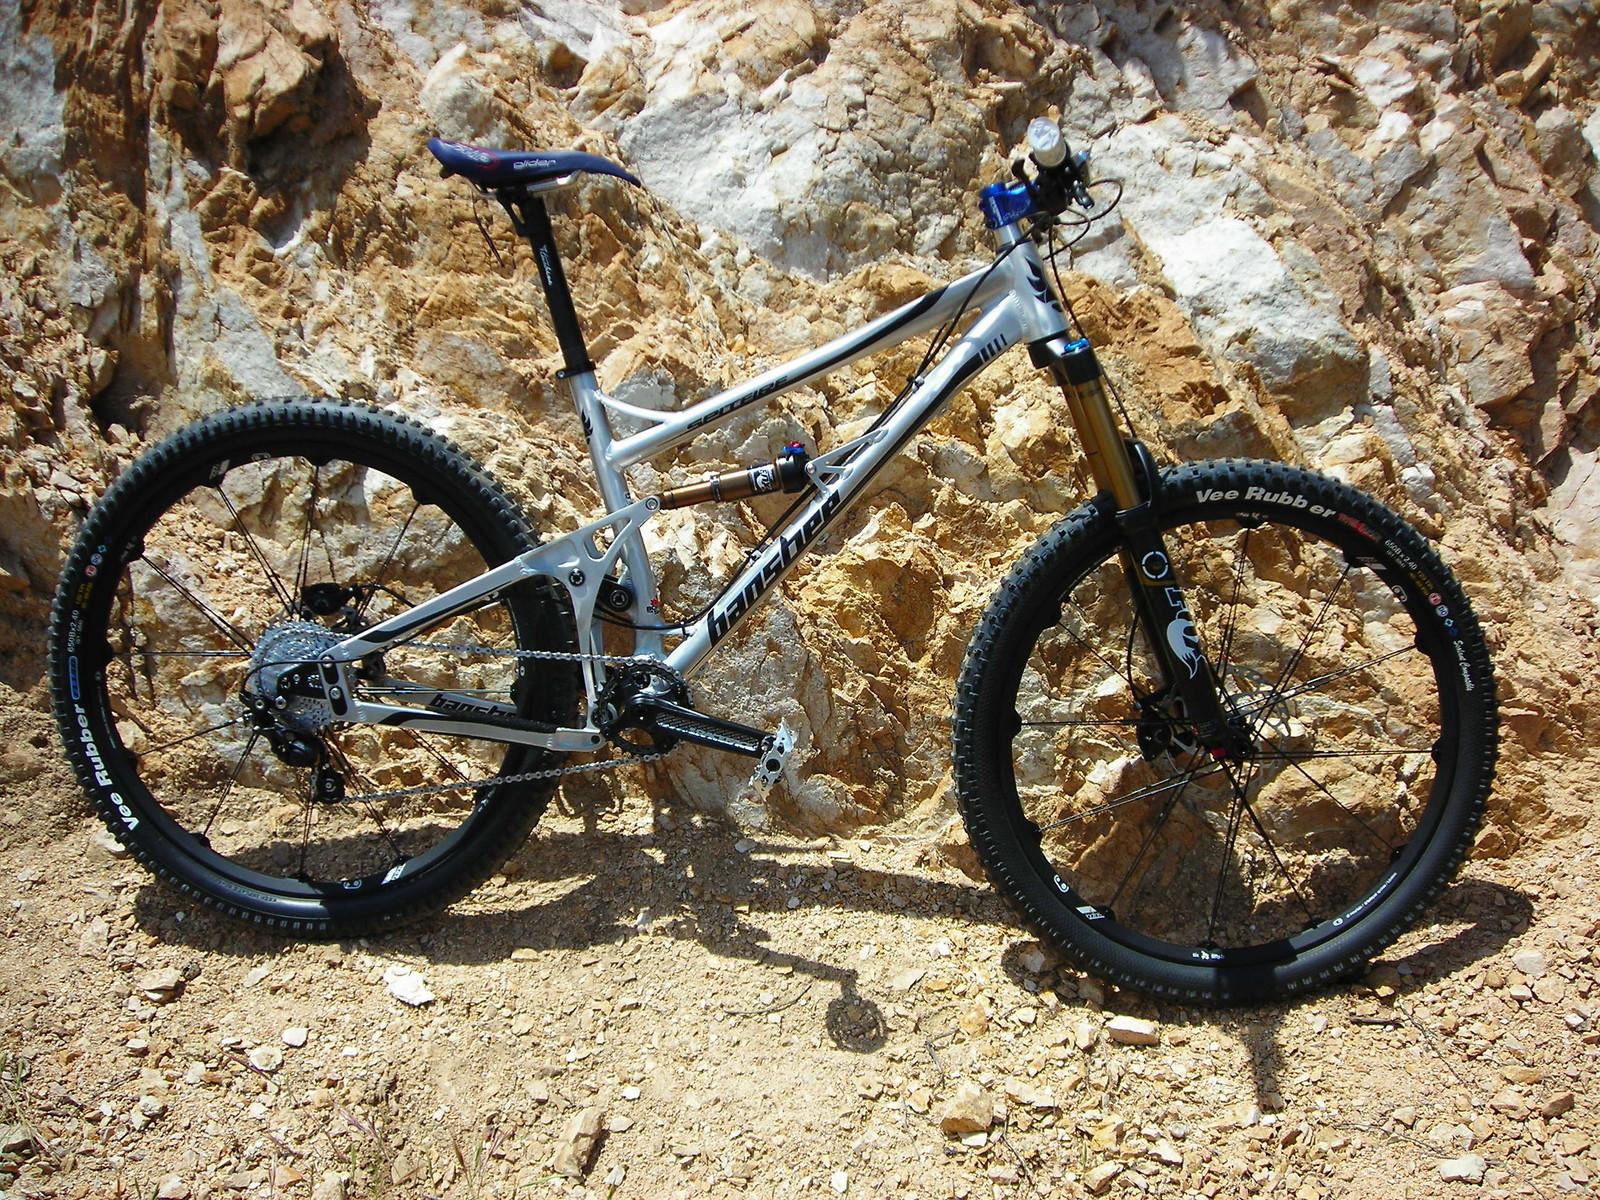 Banshee Spitfire 2014 006 - Scht!cky - Mountain Biking Pictures - Vital MTB